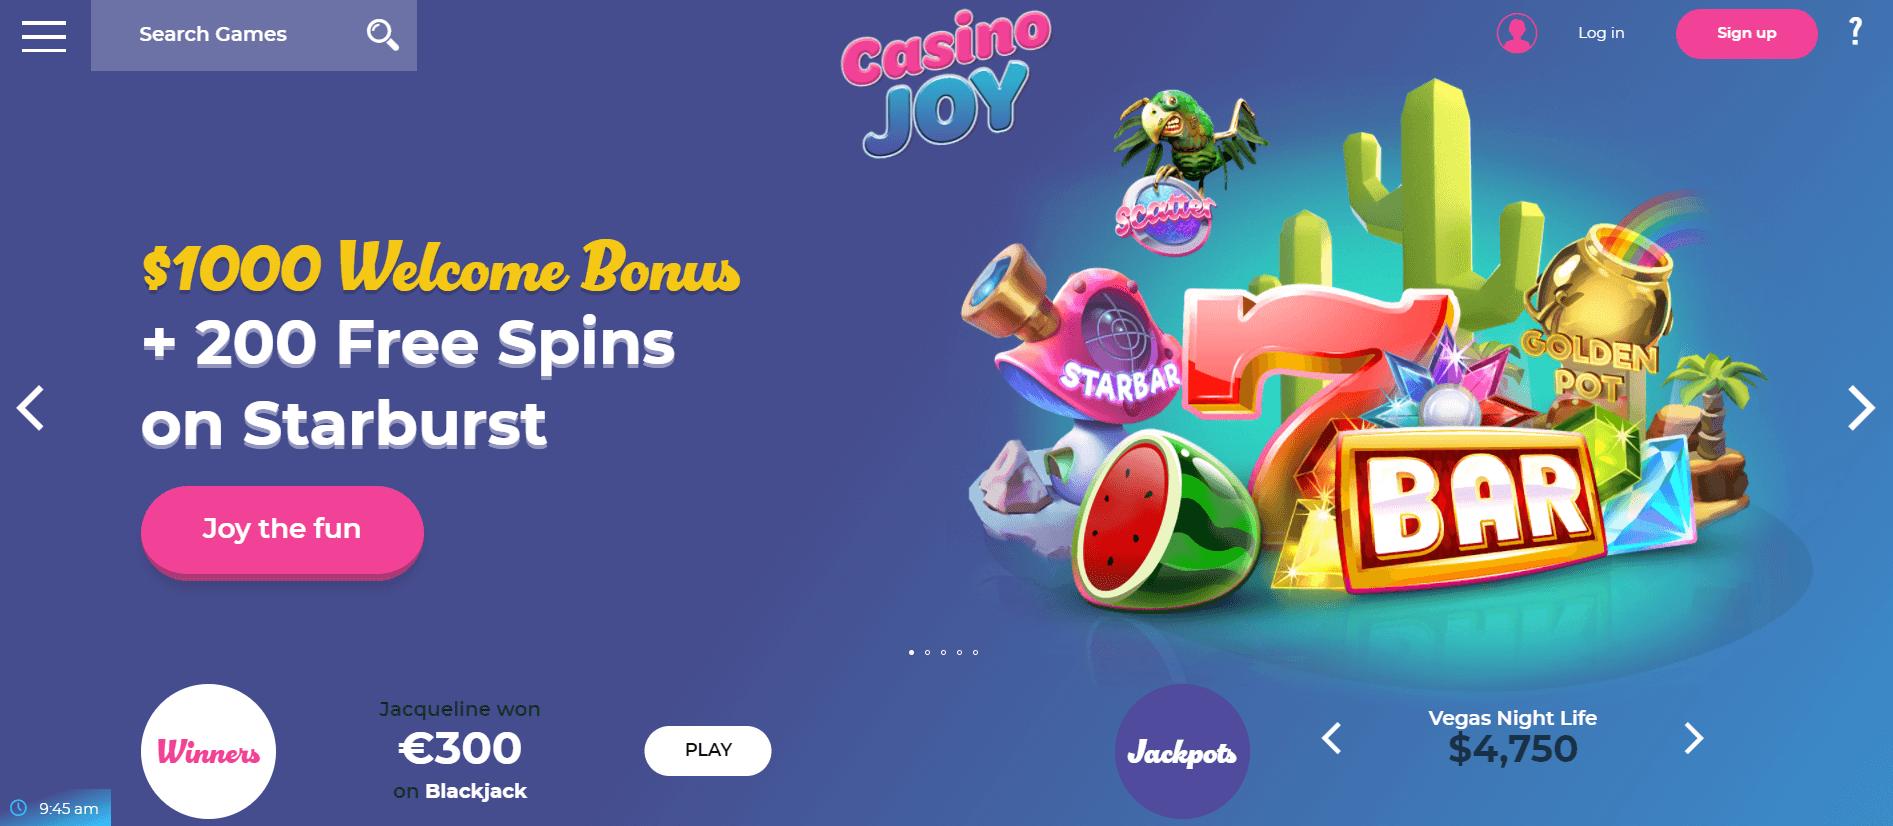 Casino Joy welcome package